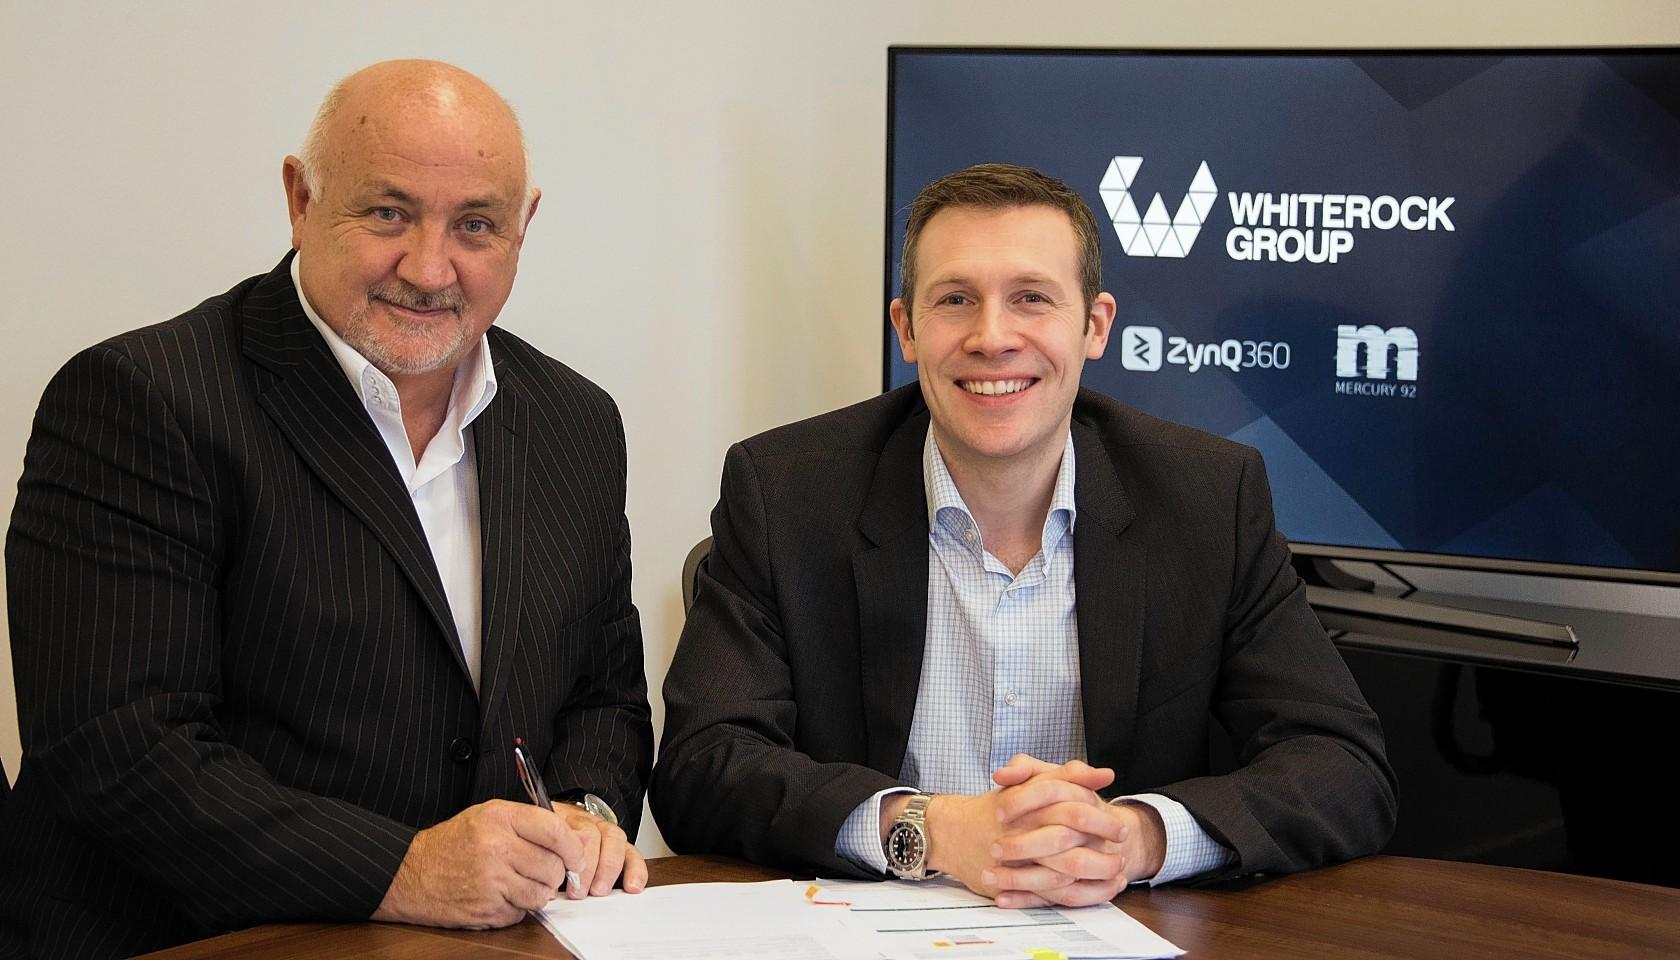 Brian Dillon, managing director of Whiterock Group, and Ewan MacKinnon of Maven Partners